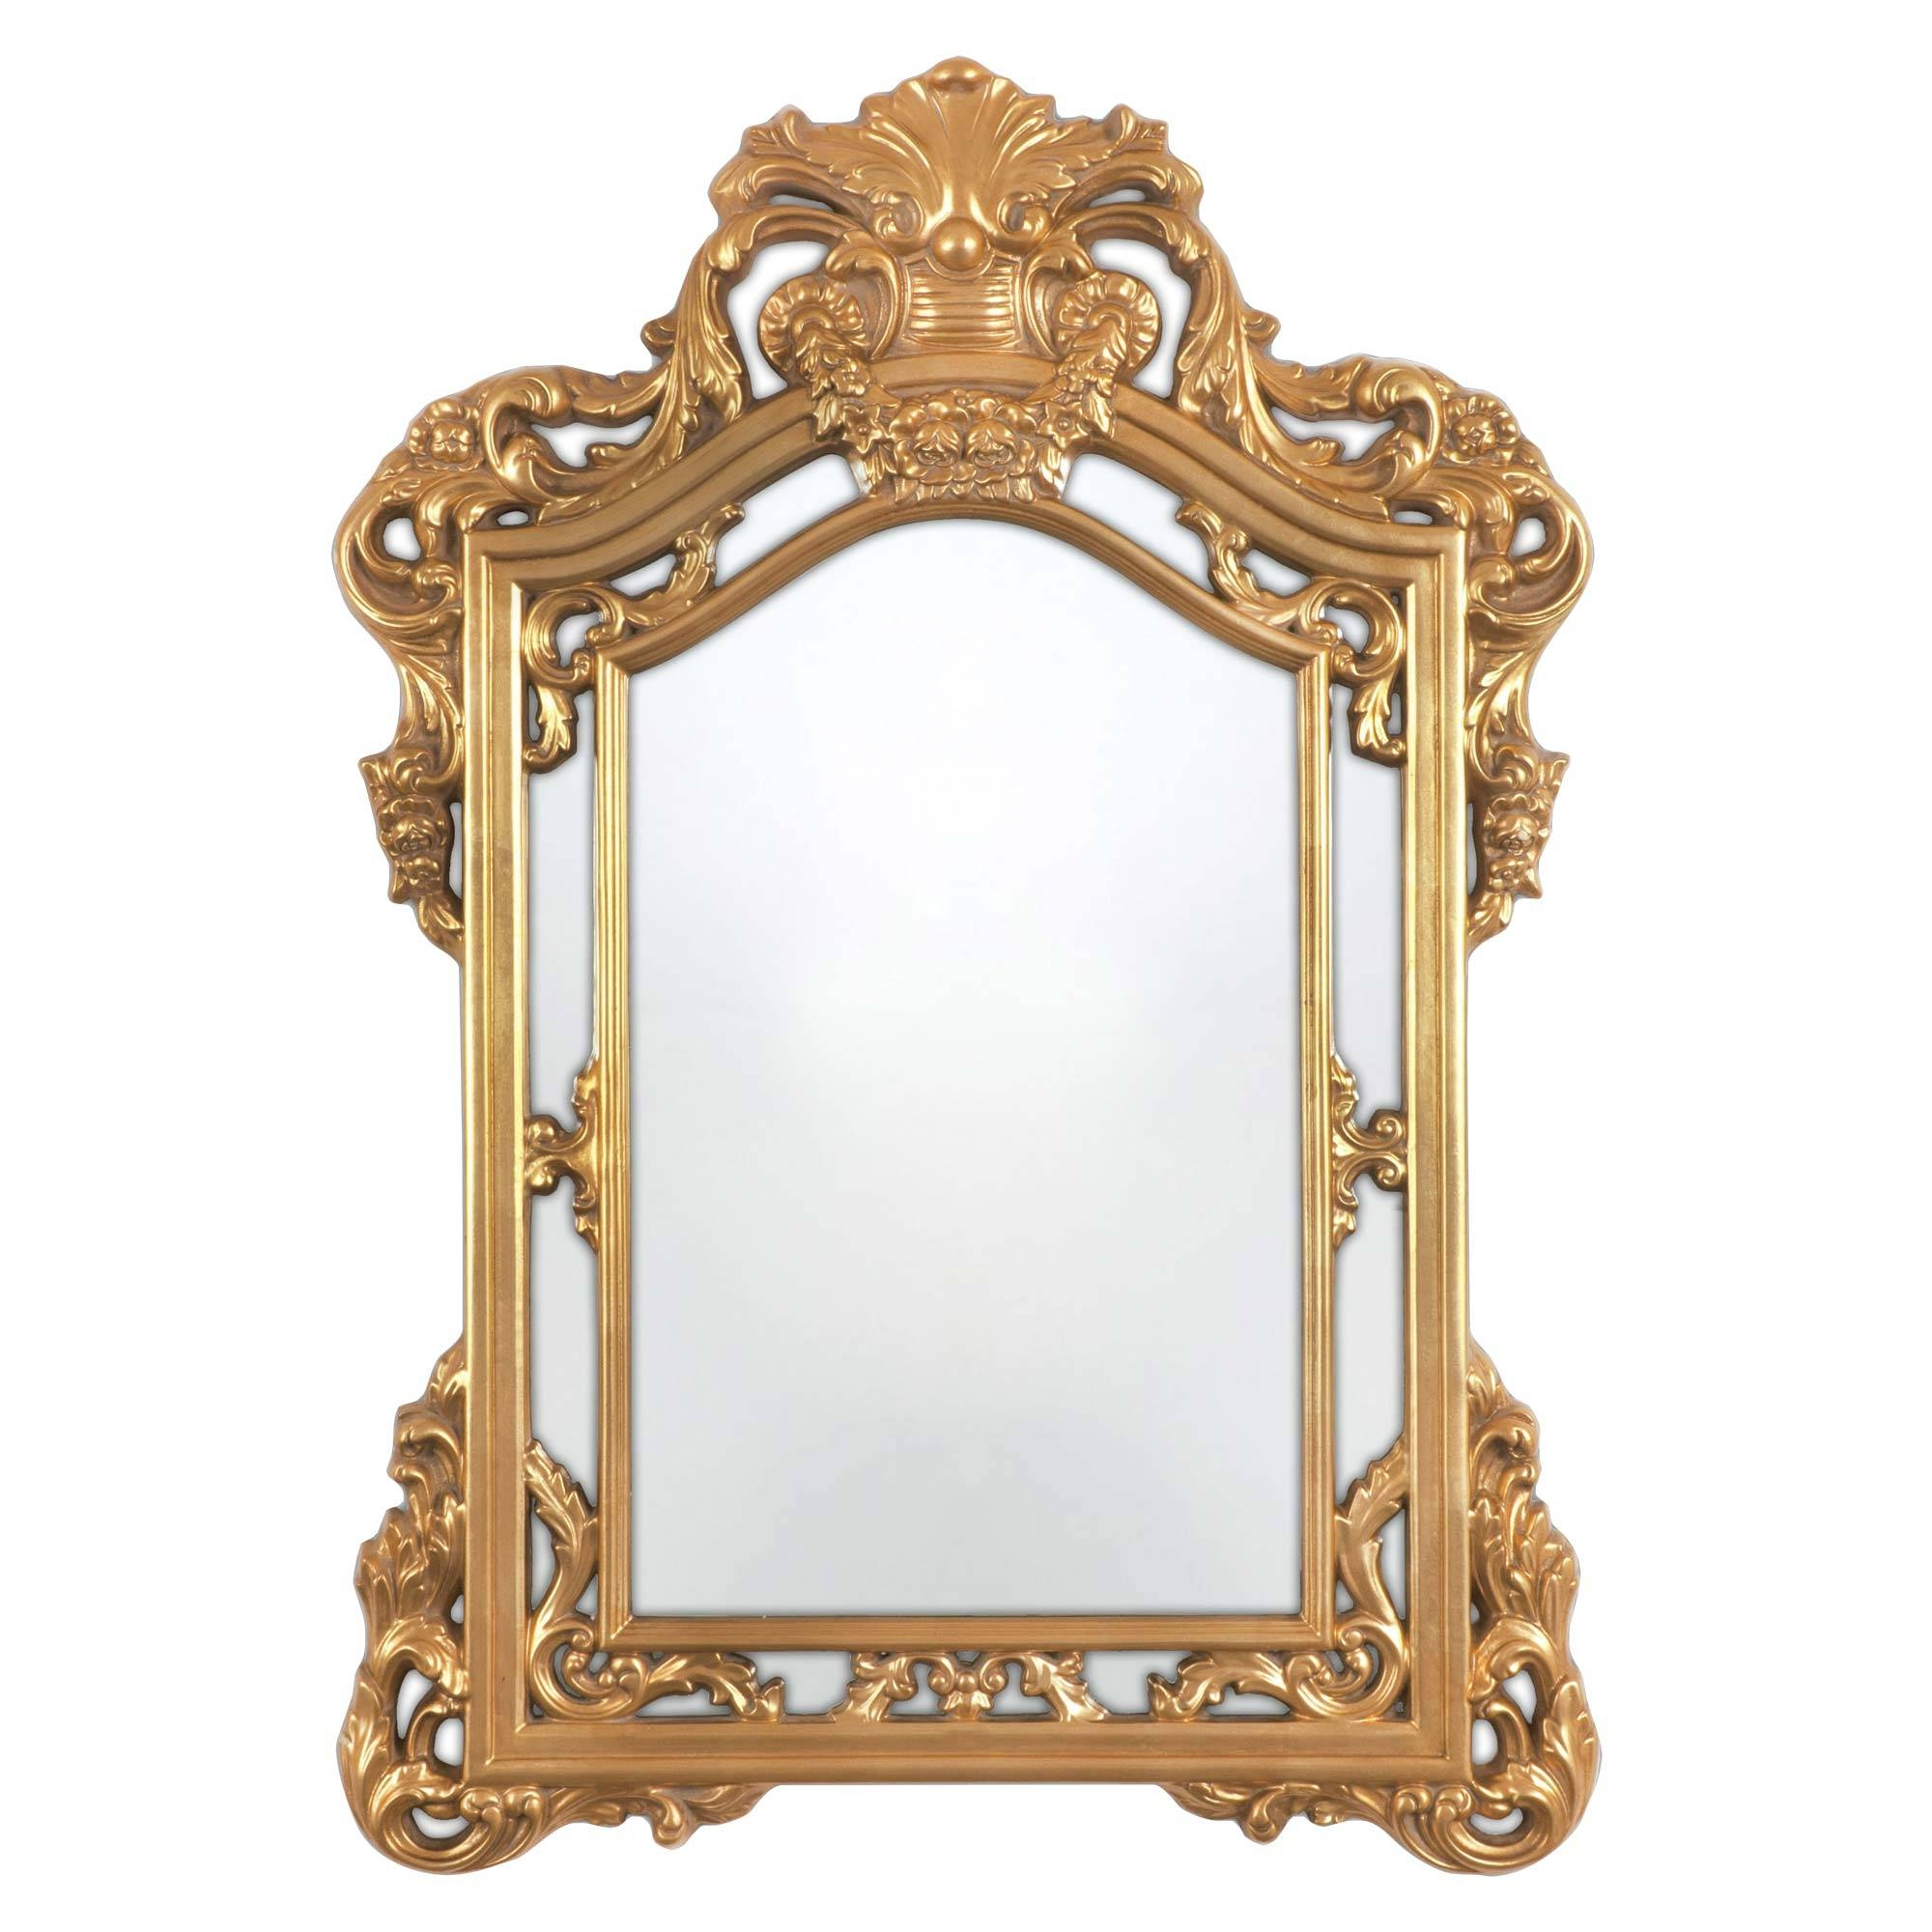 Bathroom: Astounding Baroque Mirror With Unique Frame For Bathroom within Silver Baroque Mirrors (Image 3 of 15)